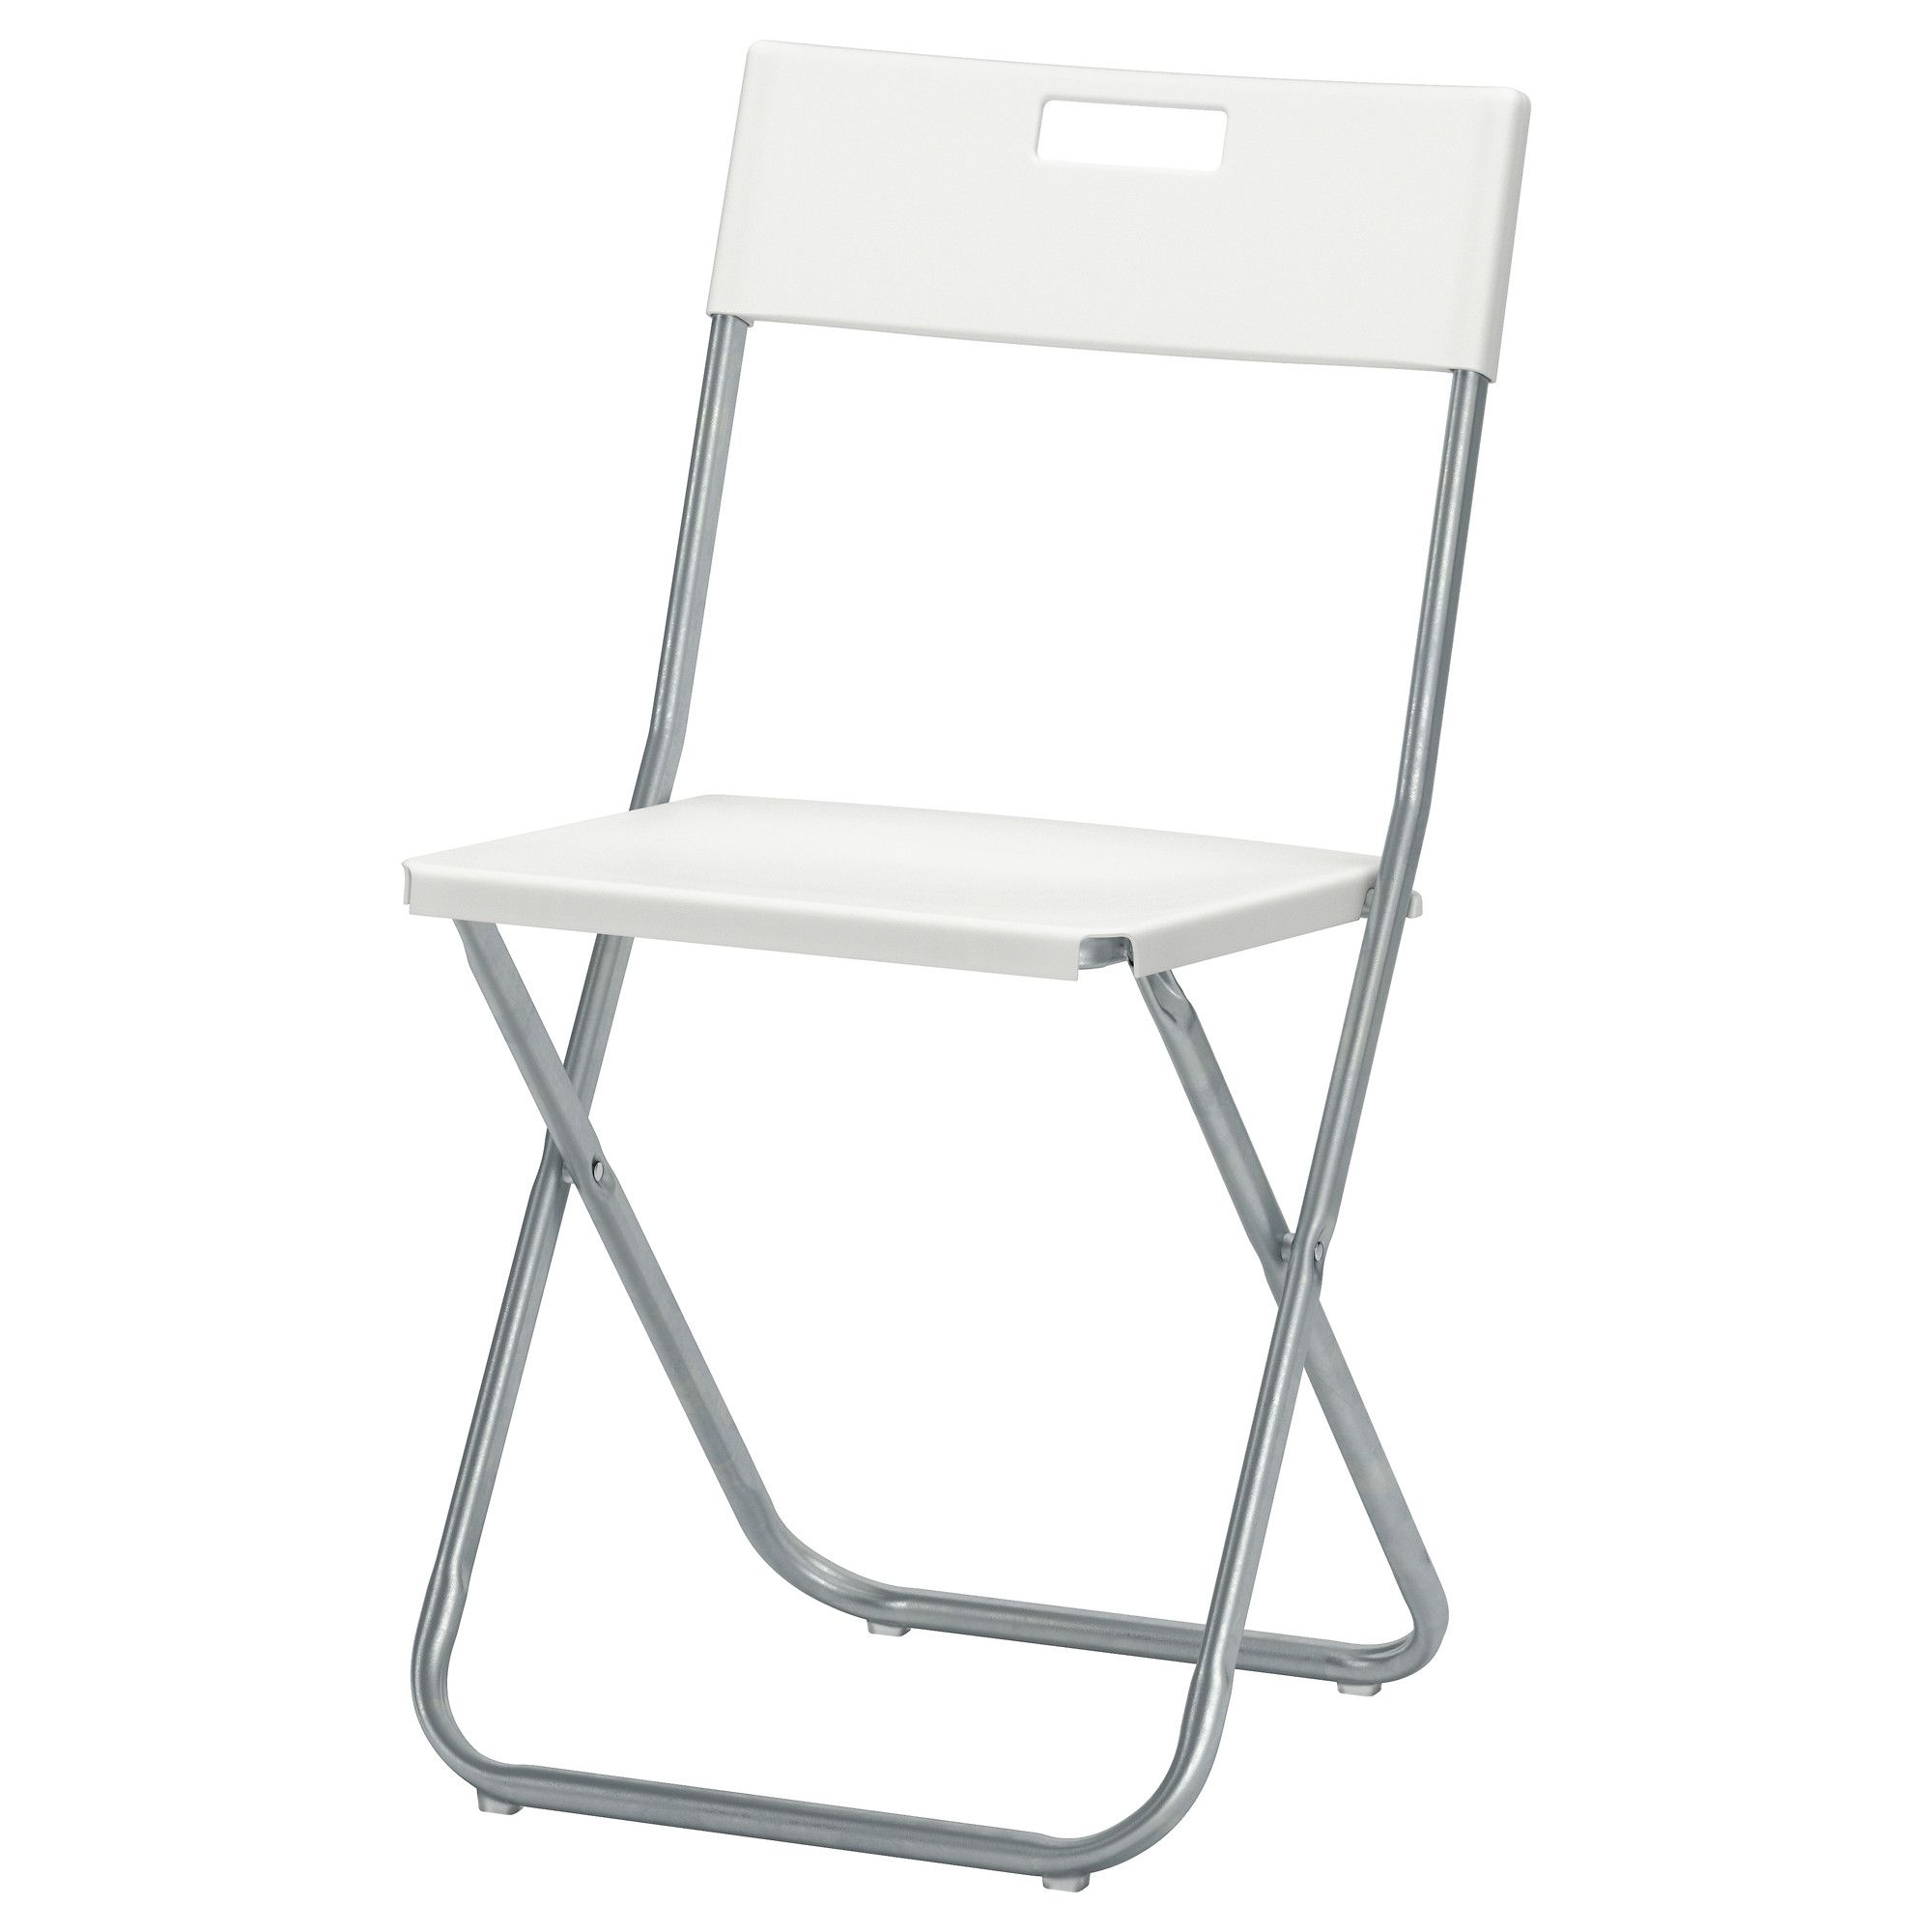 White crib for sale kijiji - Folding Table Kijiji Winnipeg Ikea Gunde Folding Chair You Can Fold The Chair So It